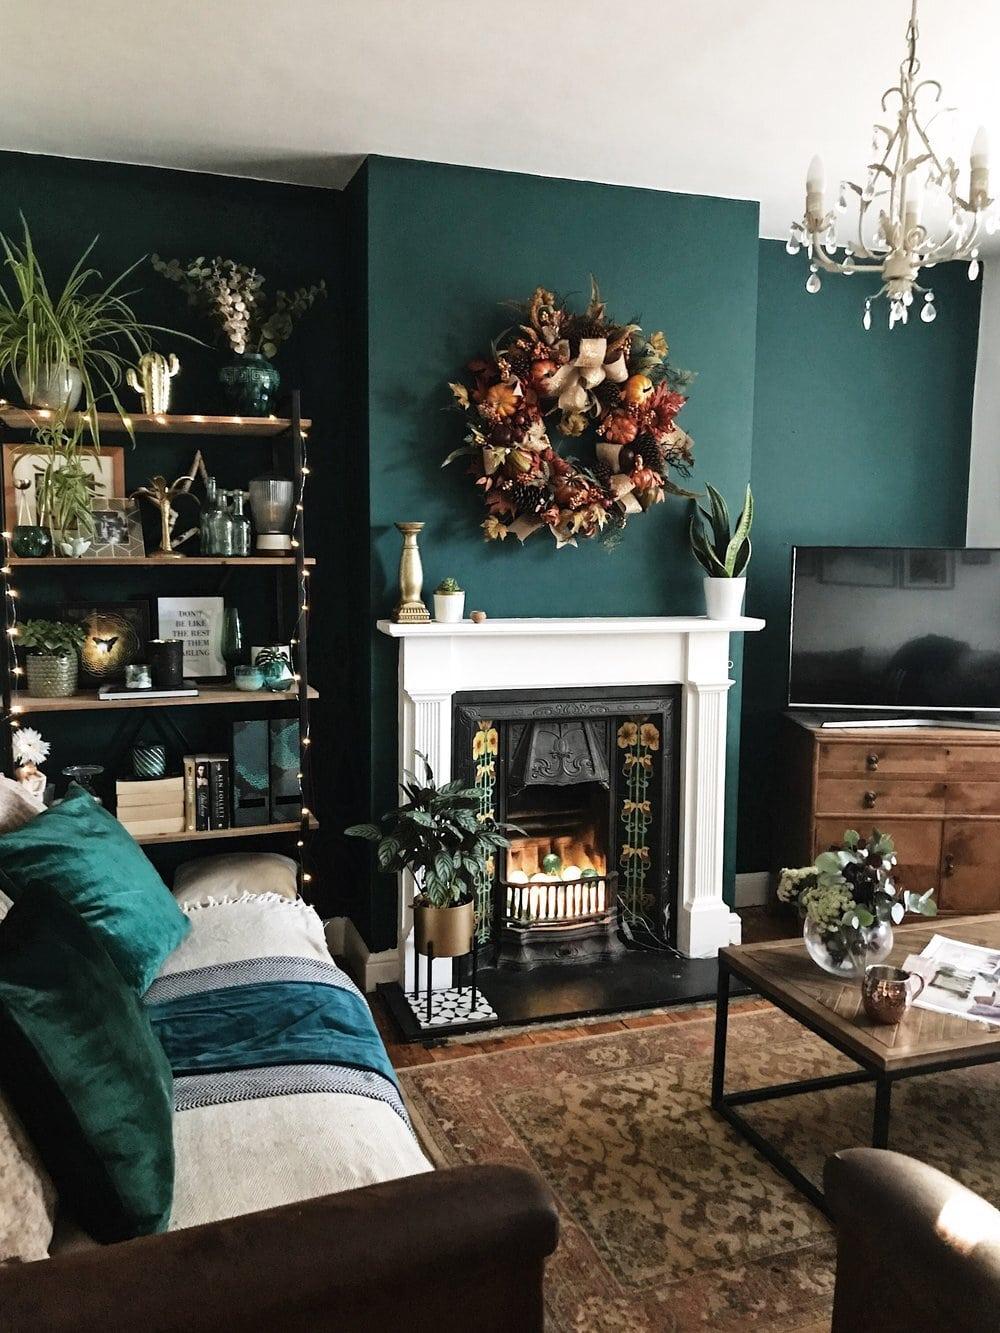 interior design, instagram, instagram trends, home decor, social media, blogging, instagram advice, blogging advice, pinterest, green wall, living room